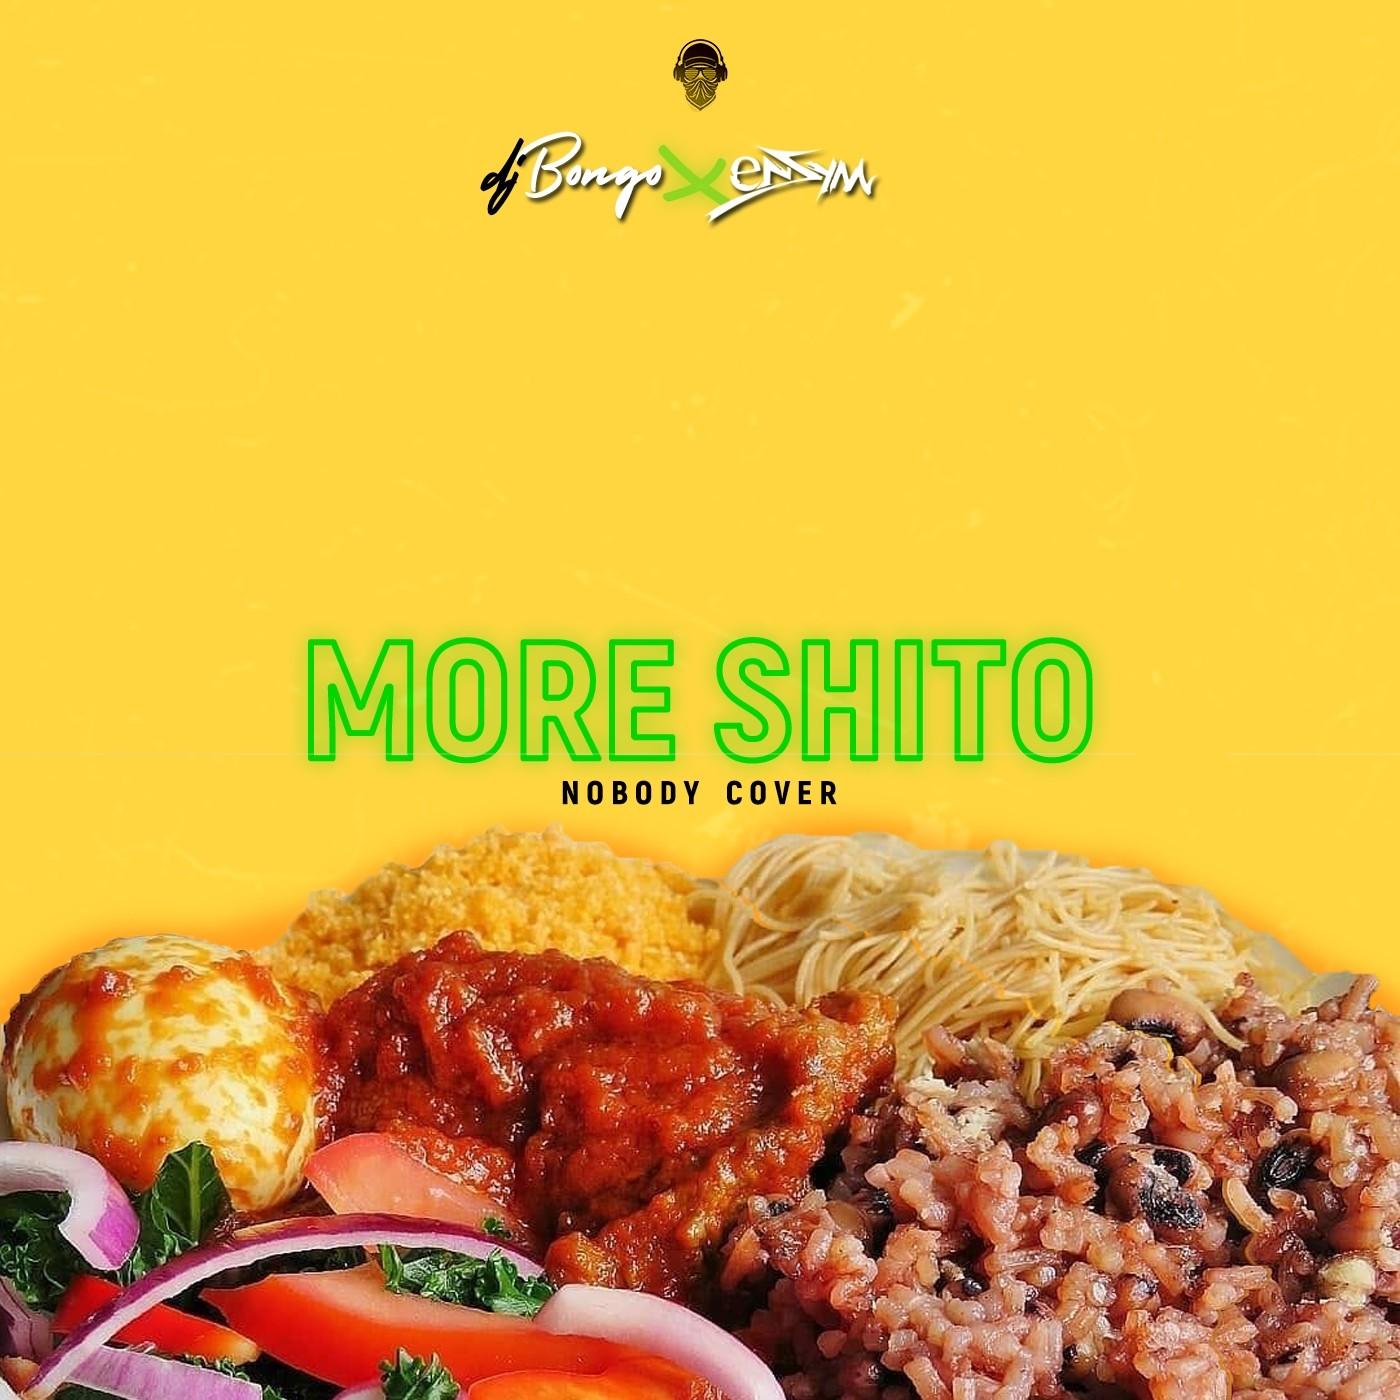 eNZYM – More Shito feat. DJ Bongo (Mastered by Kwabena Blakk)